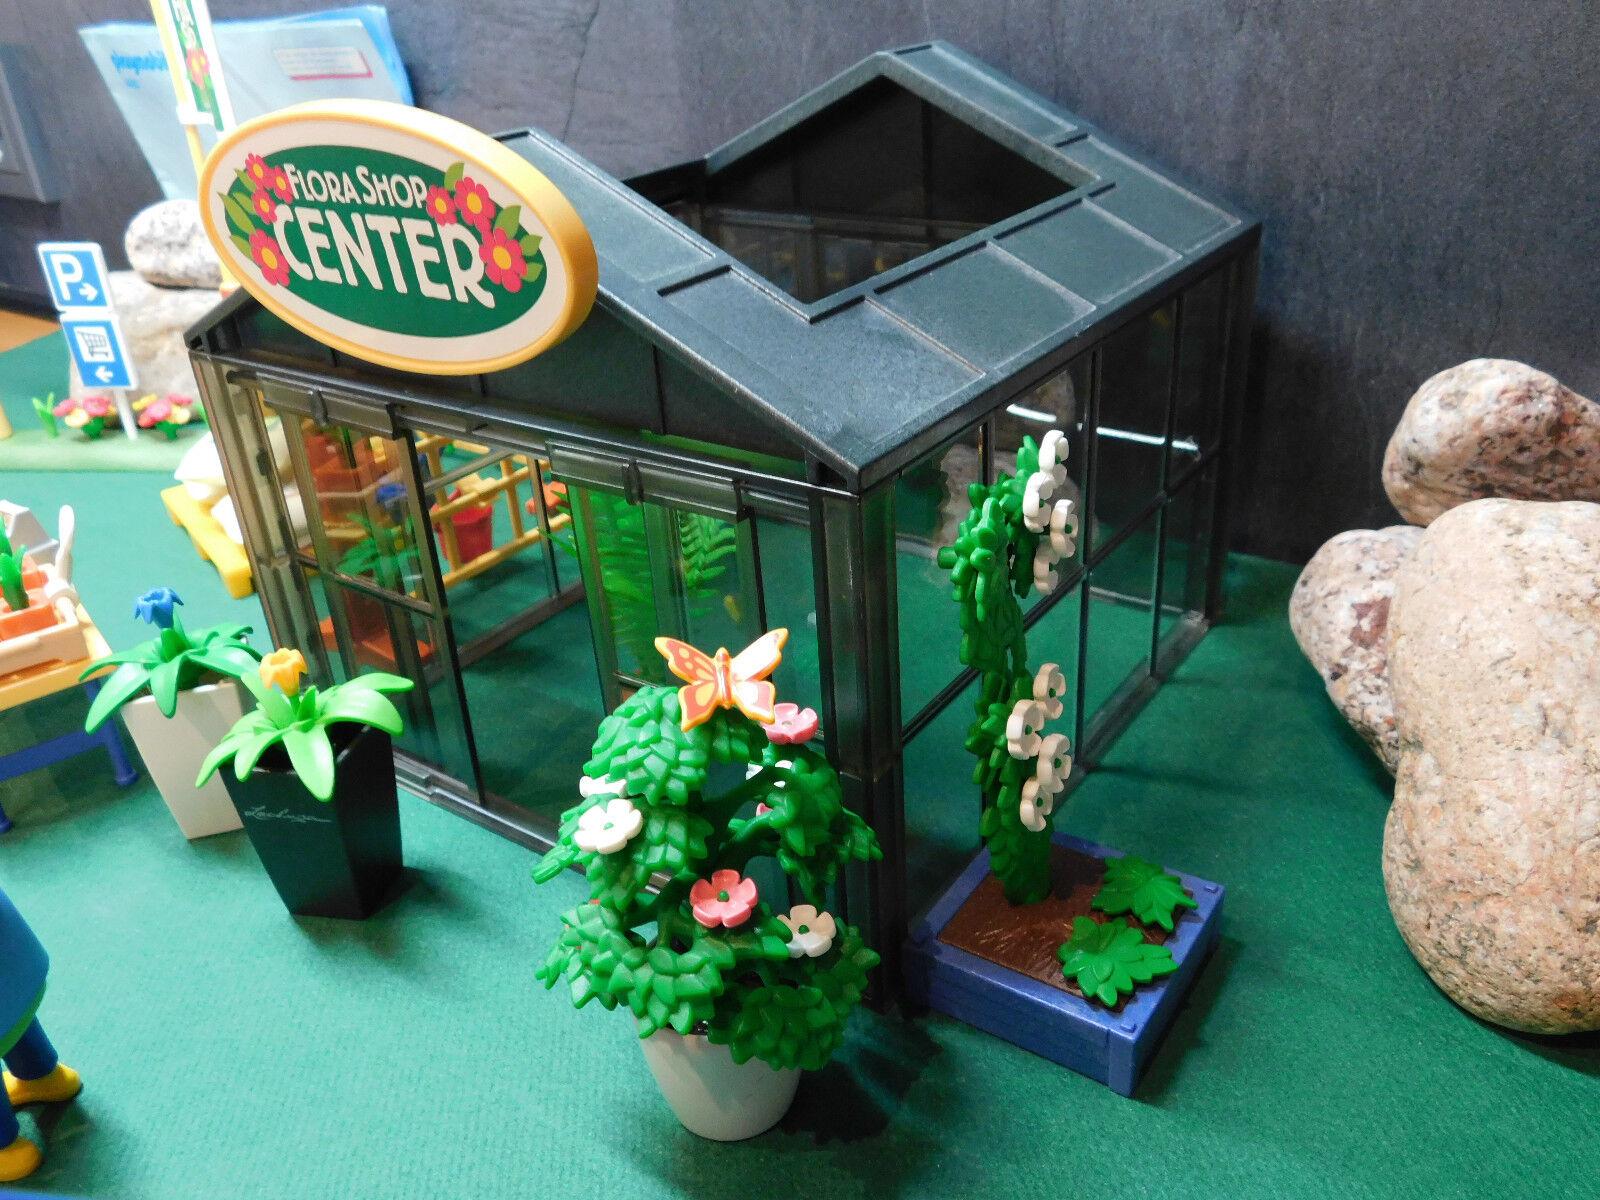 Playmobil Playmobil Playmobil Gartencenter 4880-A/2005 (BA) u. Cityvan aus 4483-A/2005, ohne OVP cac954